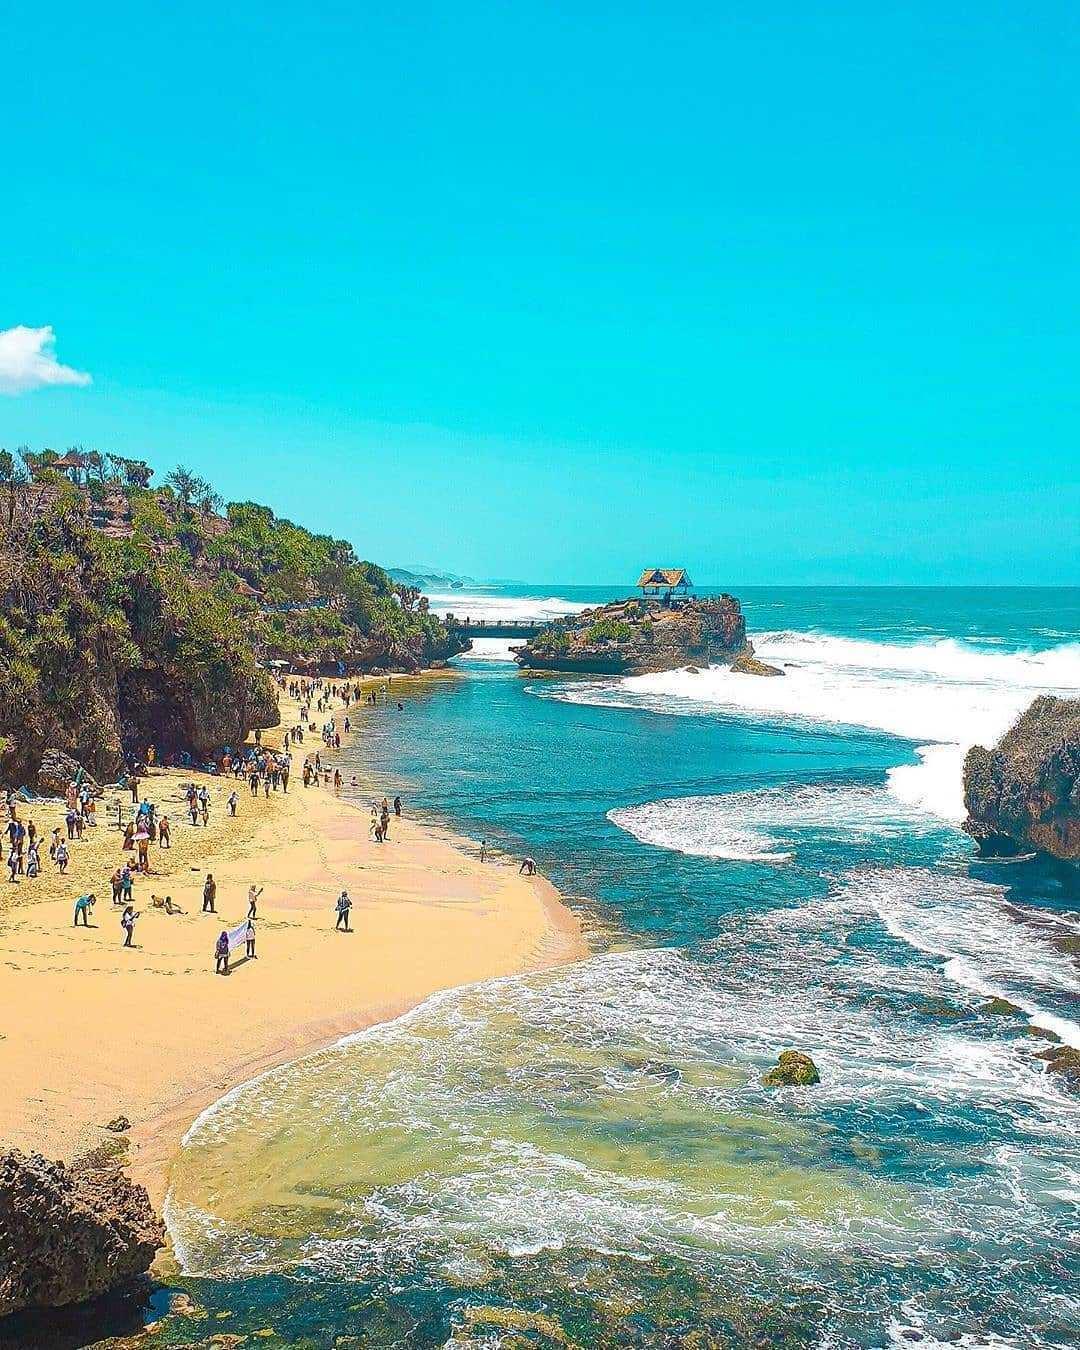 View Hamparan Pasir di Pantai Ngrawe Image From @promonyasolo